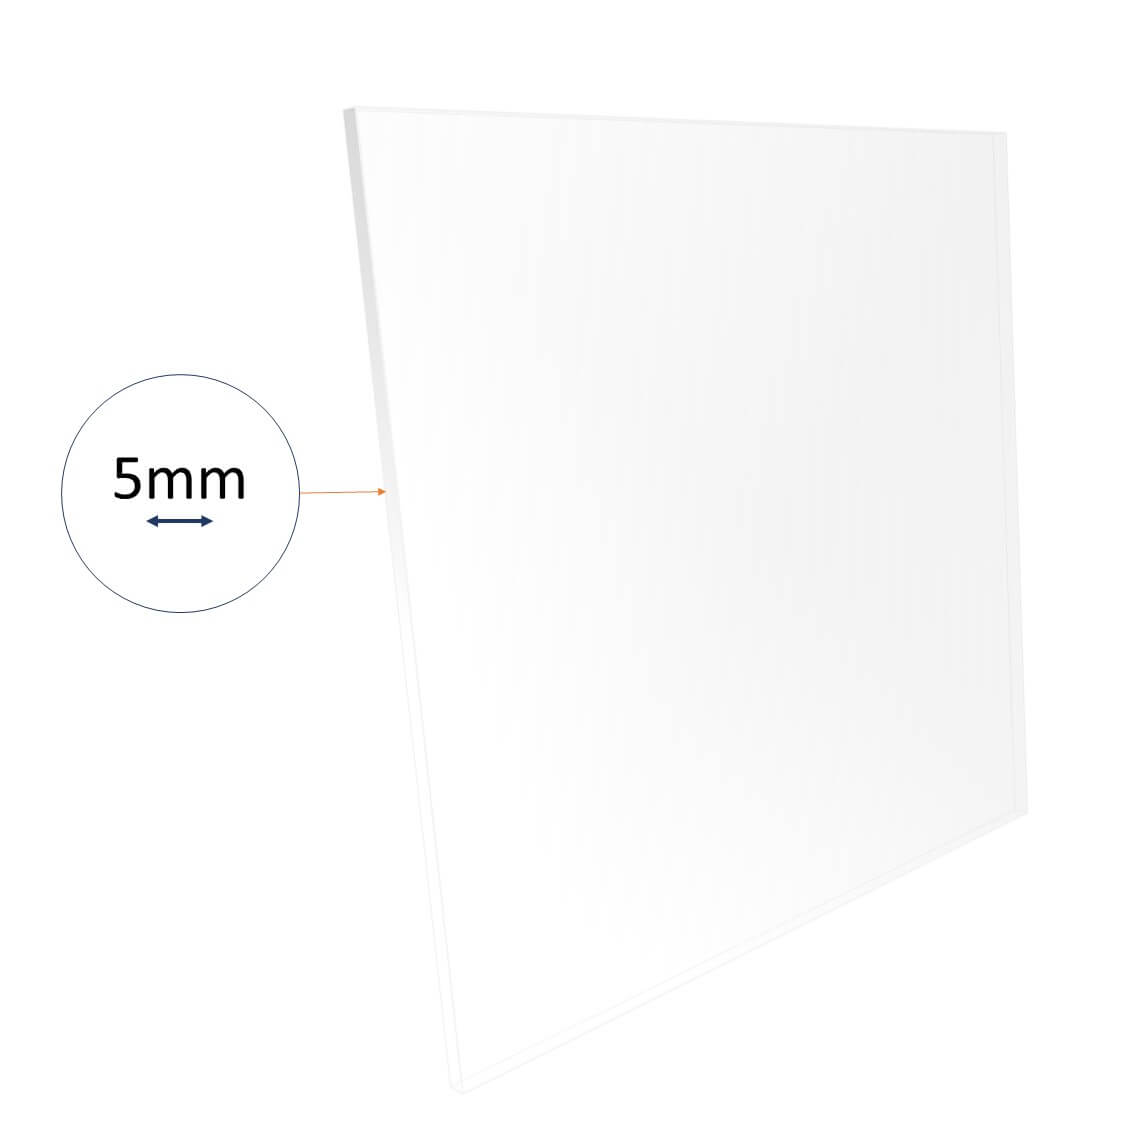 5mm acrylic sheet cut to size